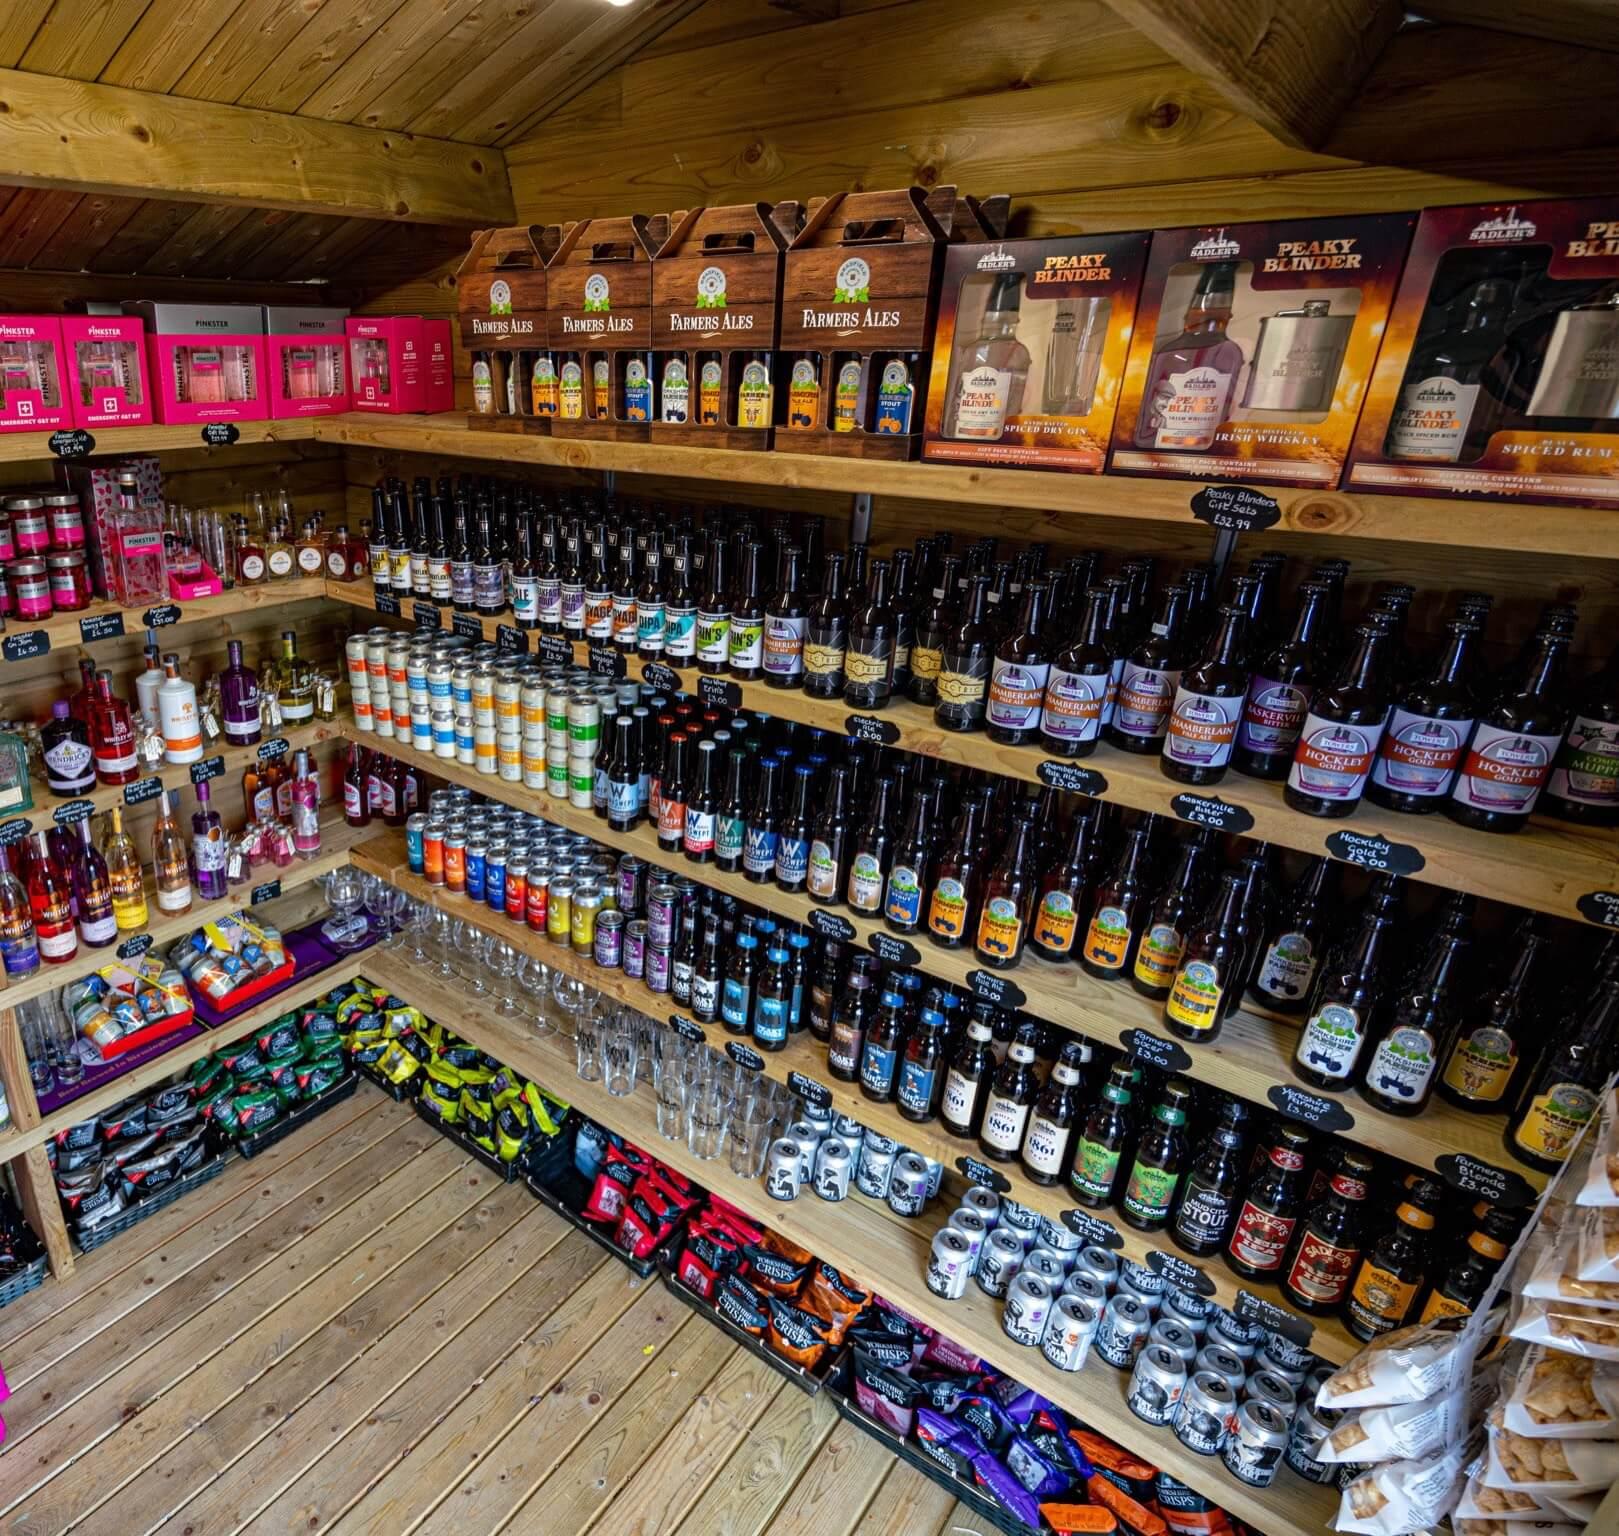 The Beer Hut